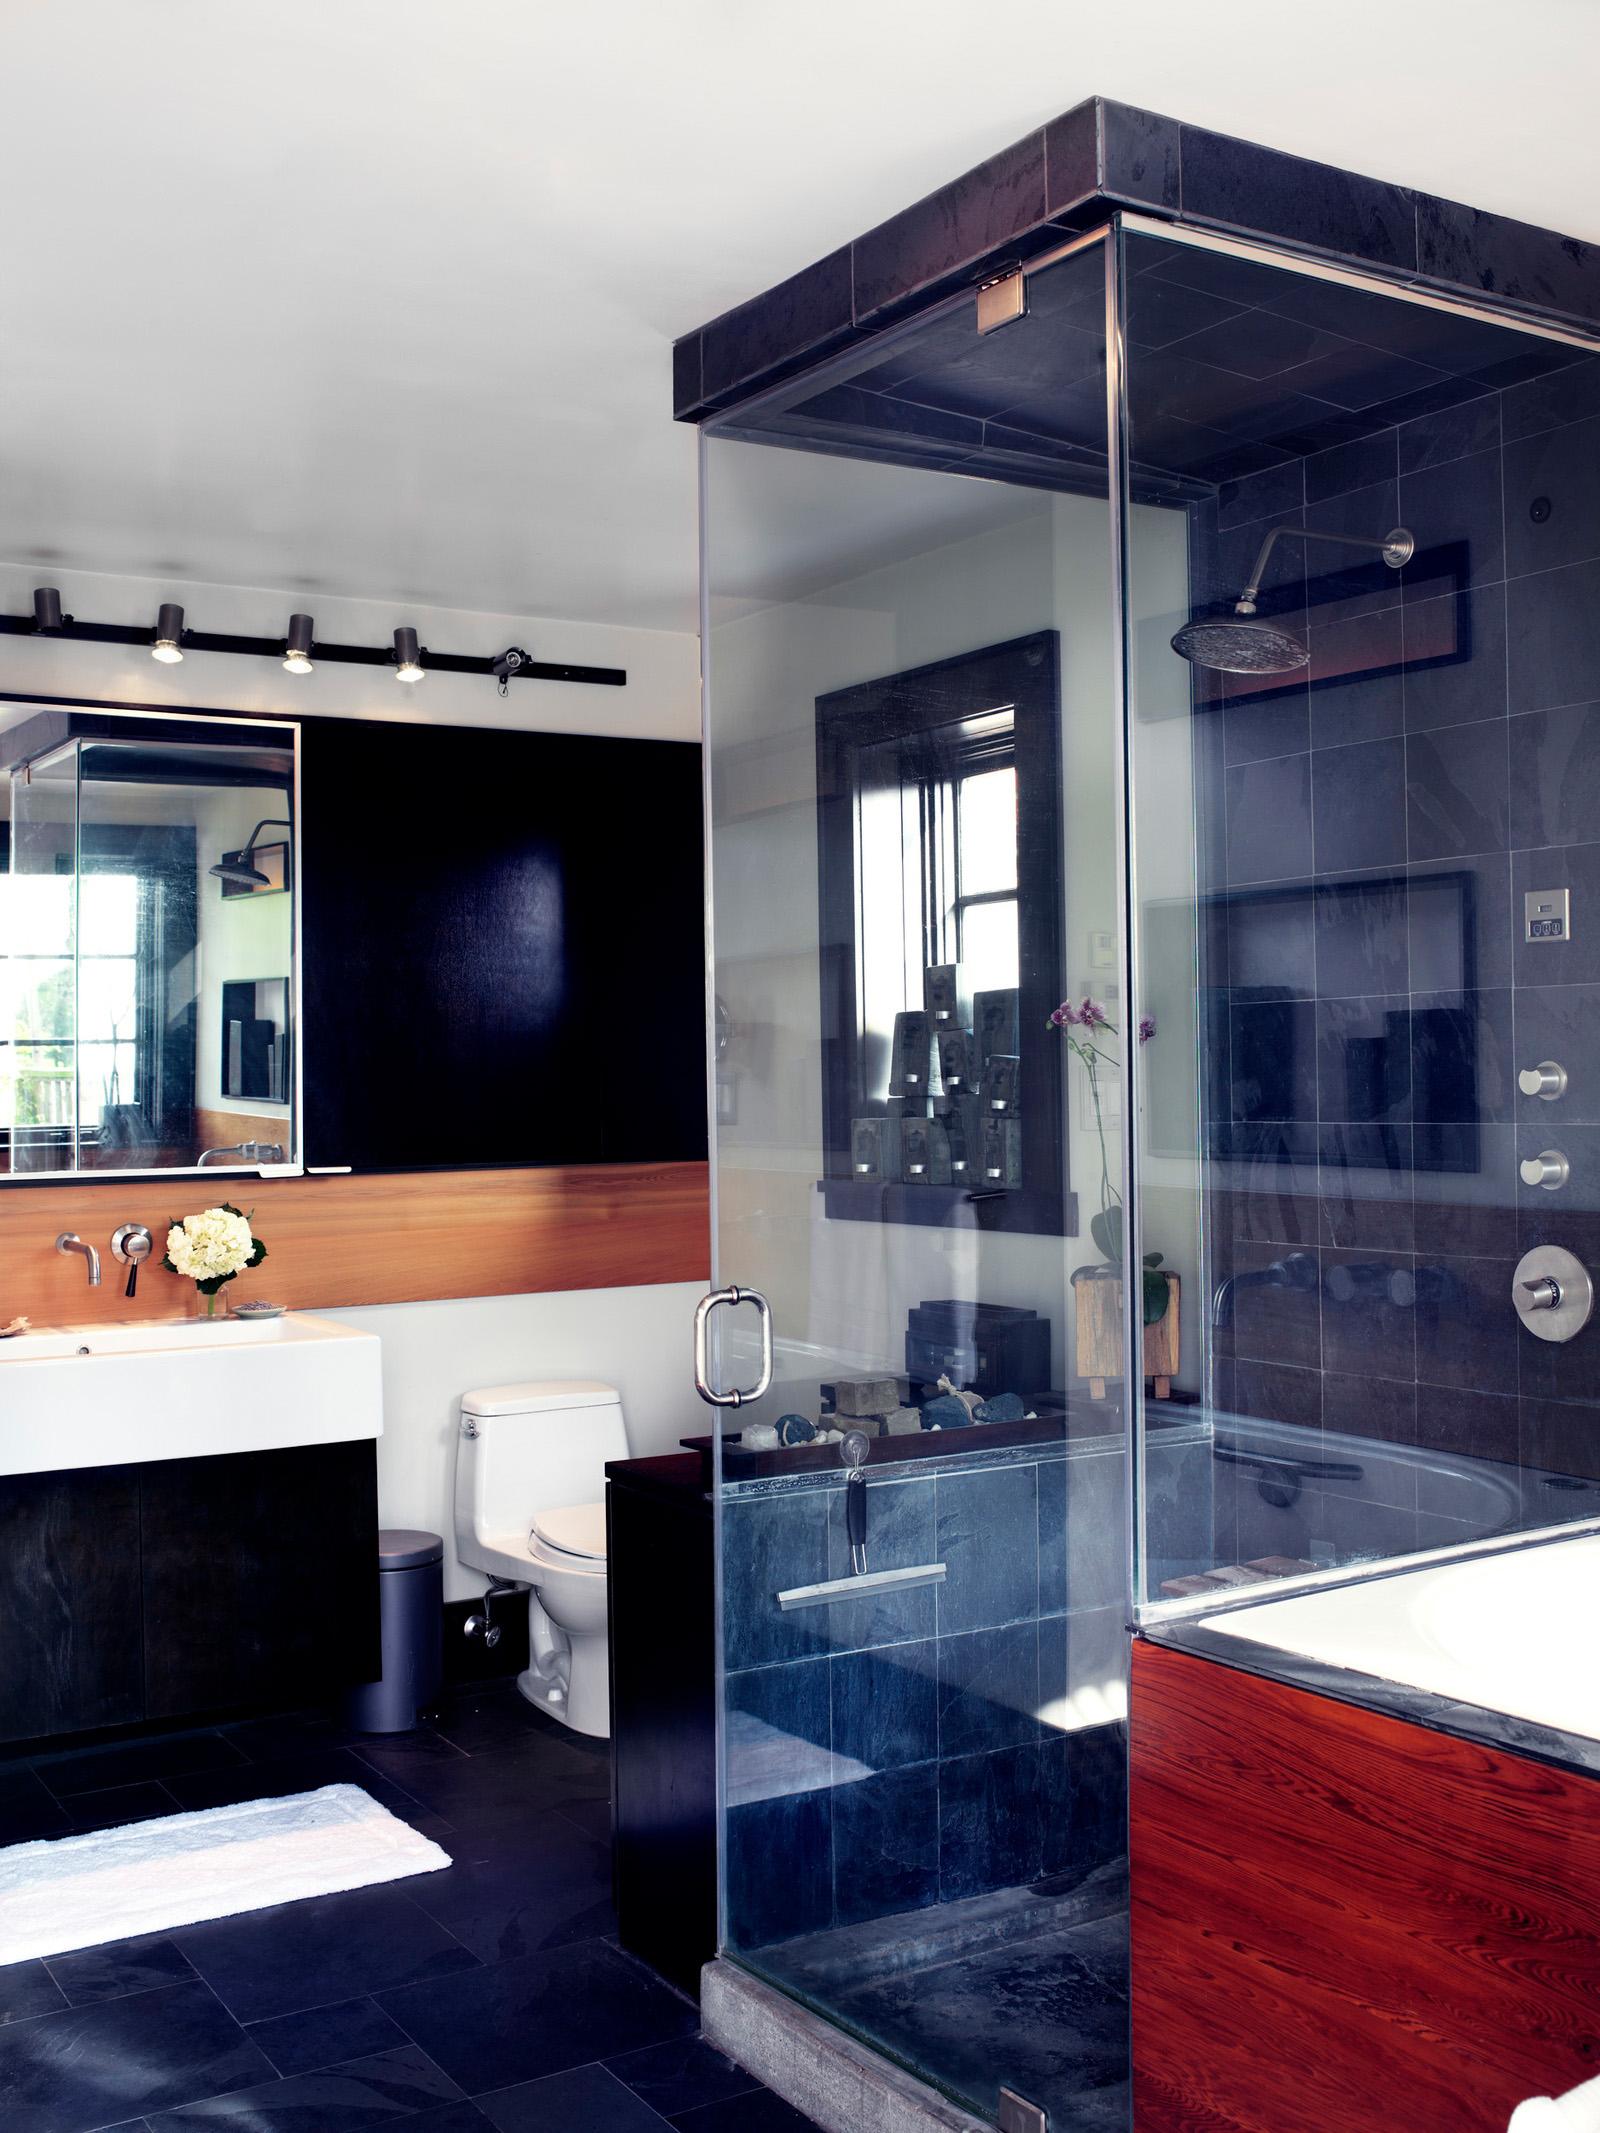 218807-10854029-08081WIS1208_Bathroom_V1_main_jpg.jpg